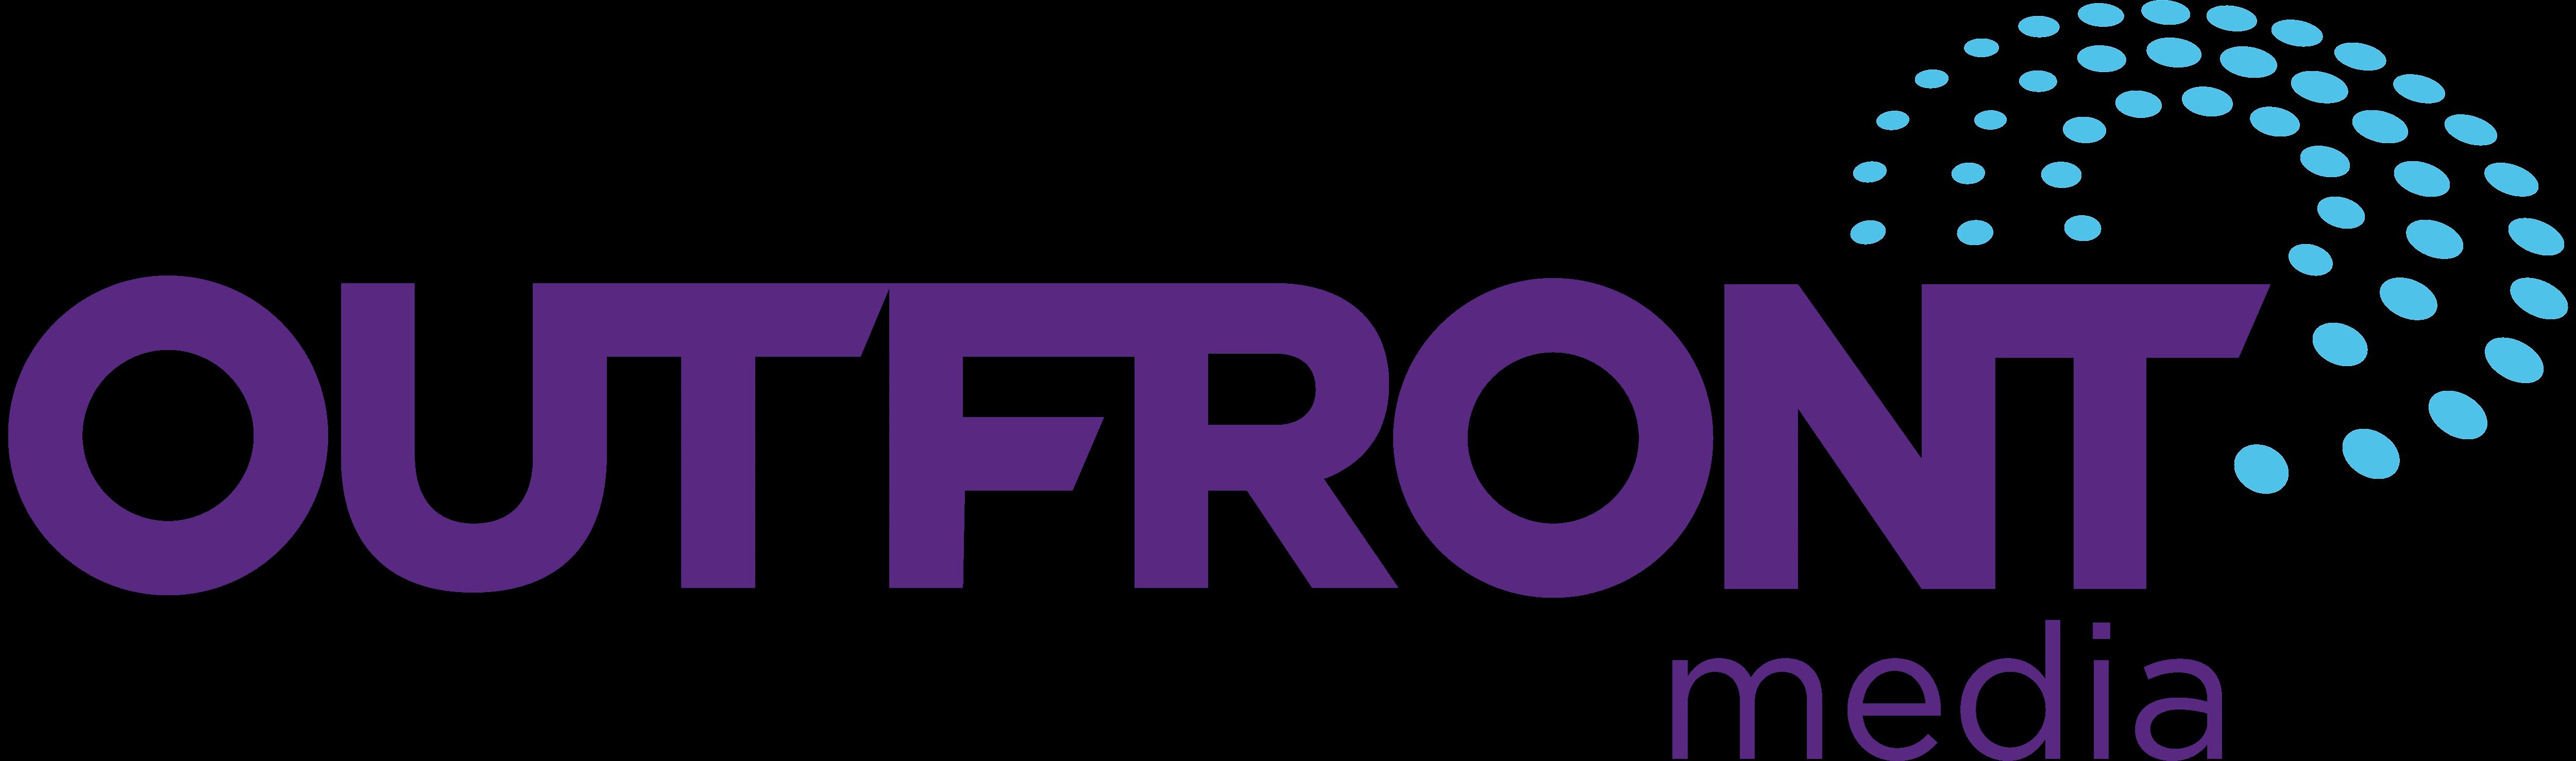 Outfront_Media_logo